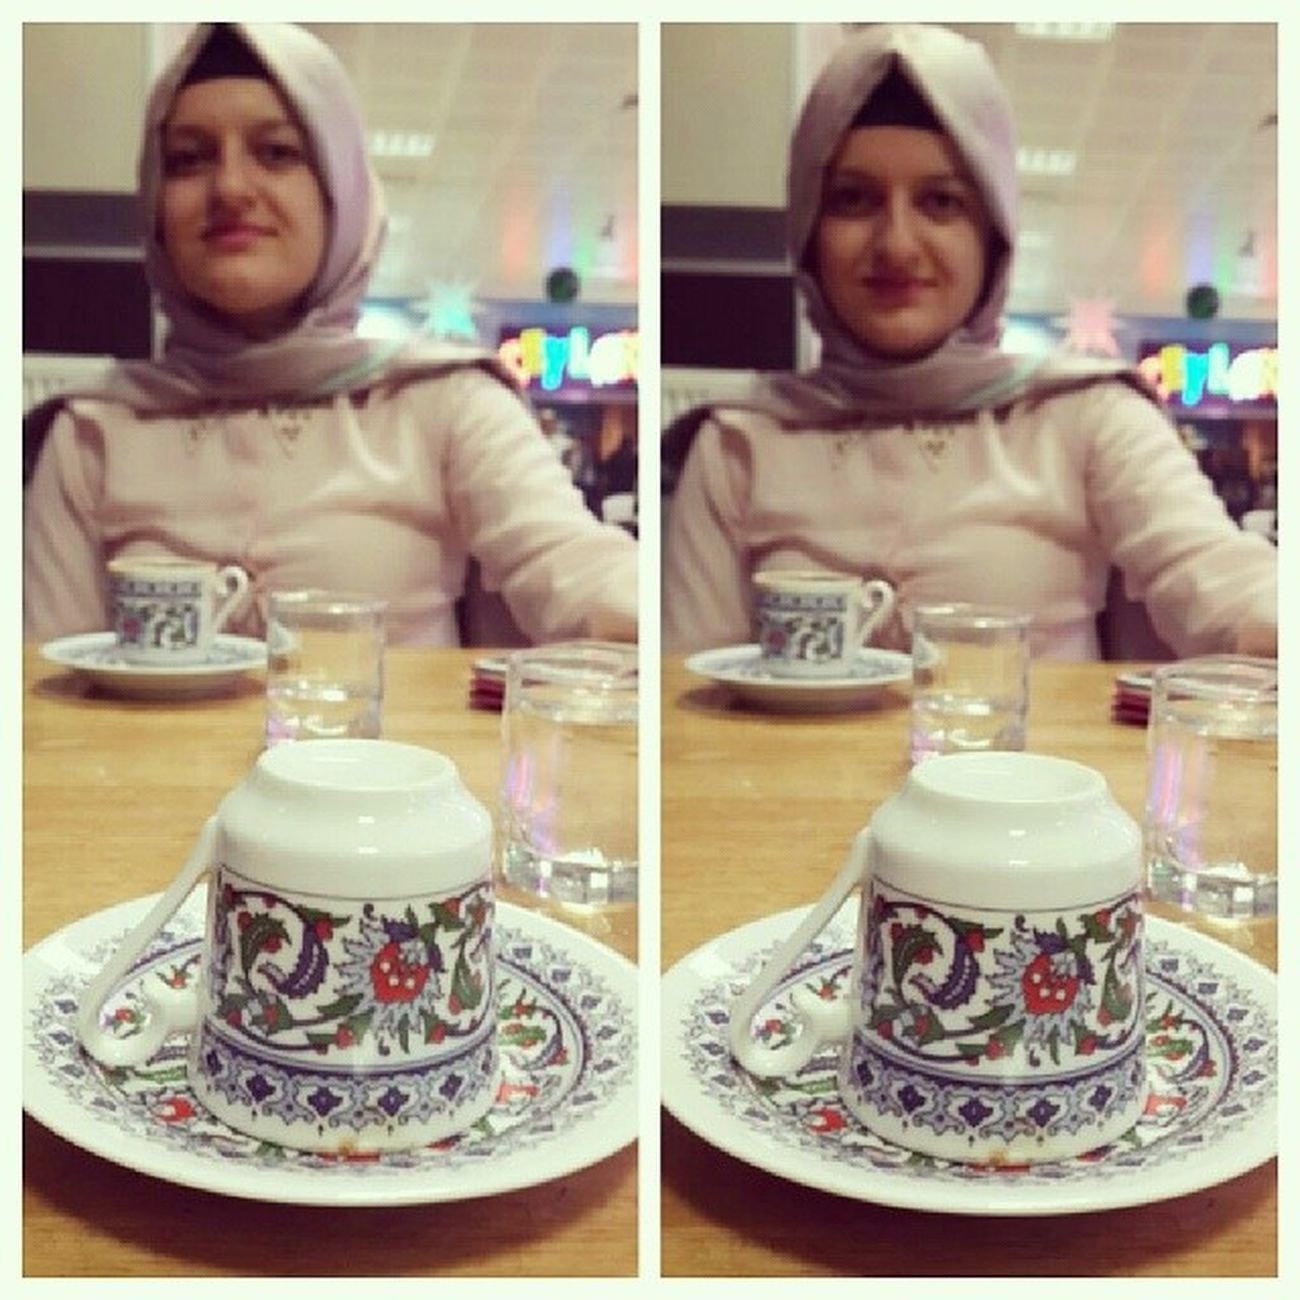 Happychristmas Birkahveninkirkyilhatrivardir Türkkahvesi Turkishcoffee yilbasibizdeboyle kutahya muş pink